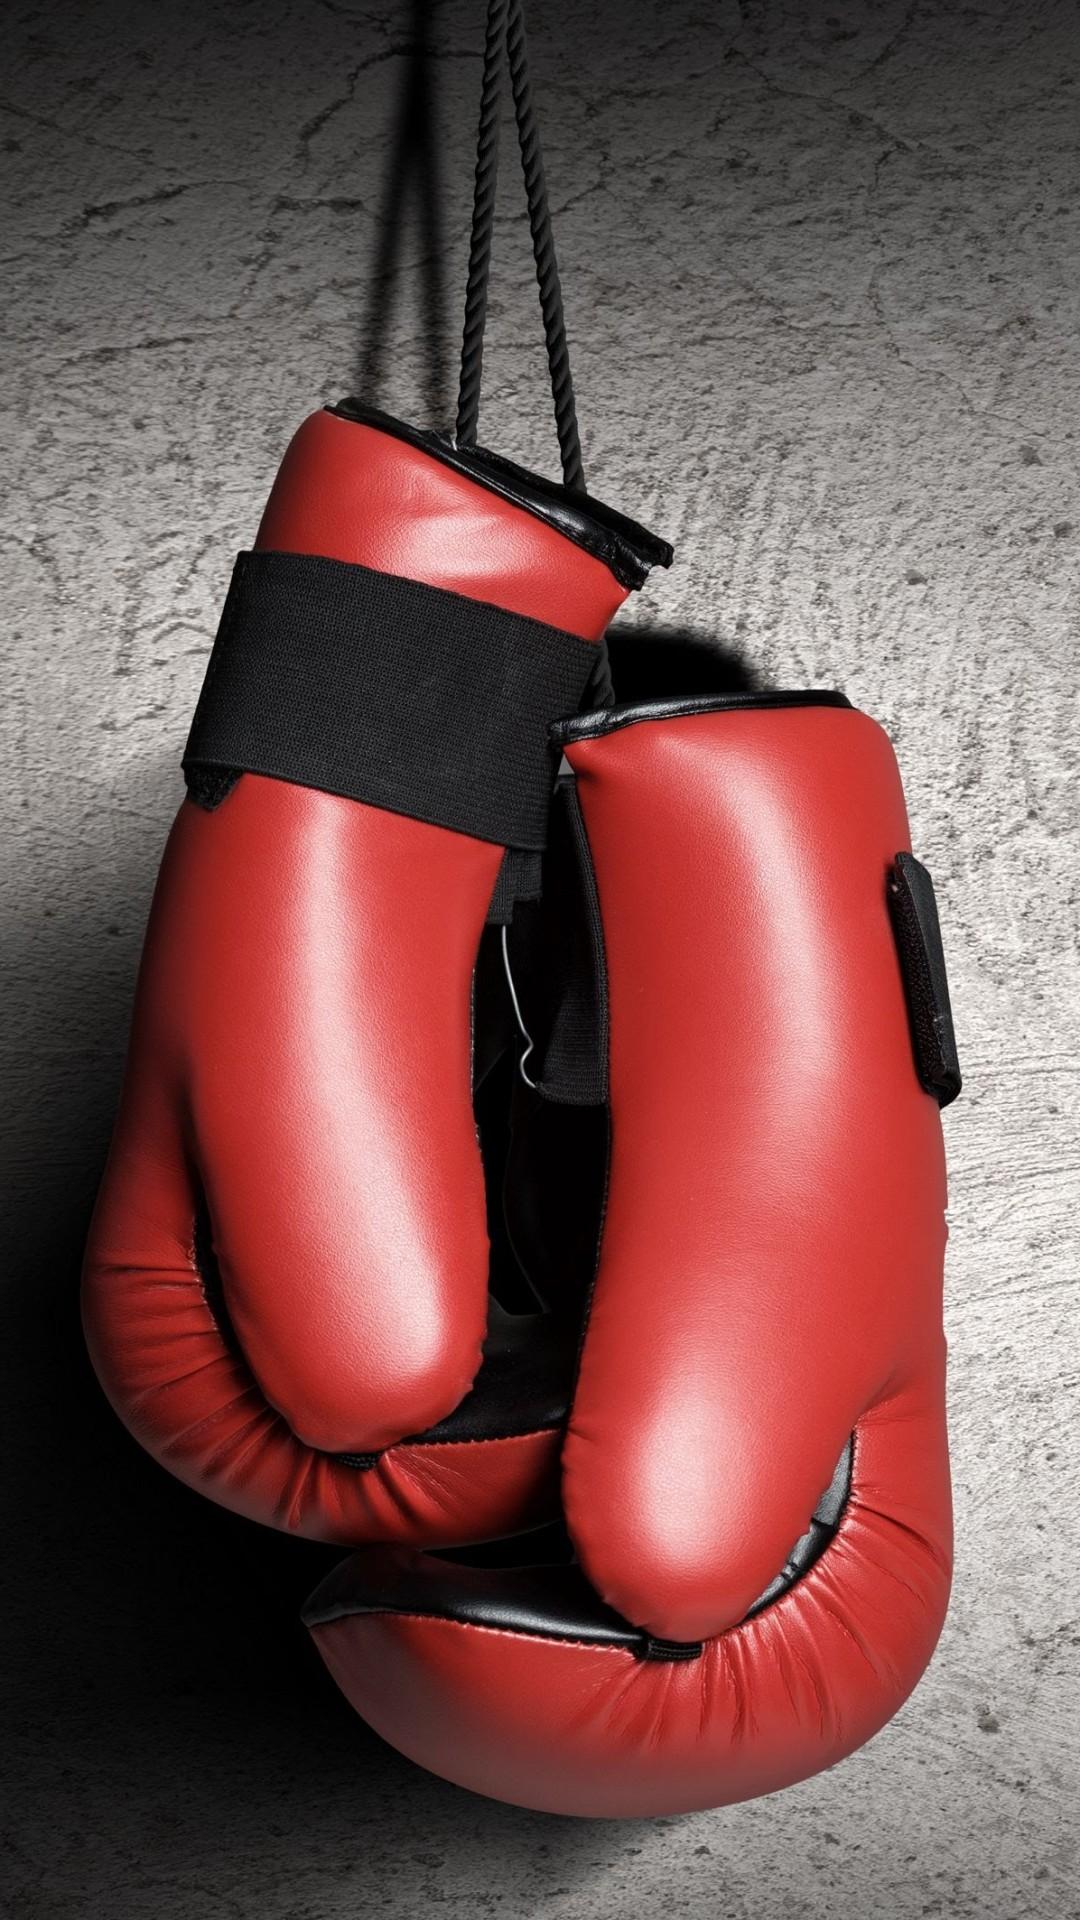 Subaru Impreza Wrx Sti Rally Car Wallpaper Wallpaper Boxing Gloves Red Boxing Sport 11209